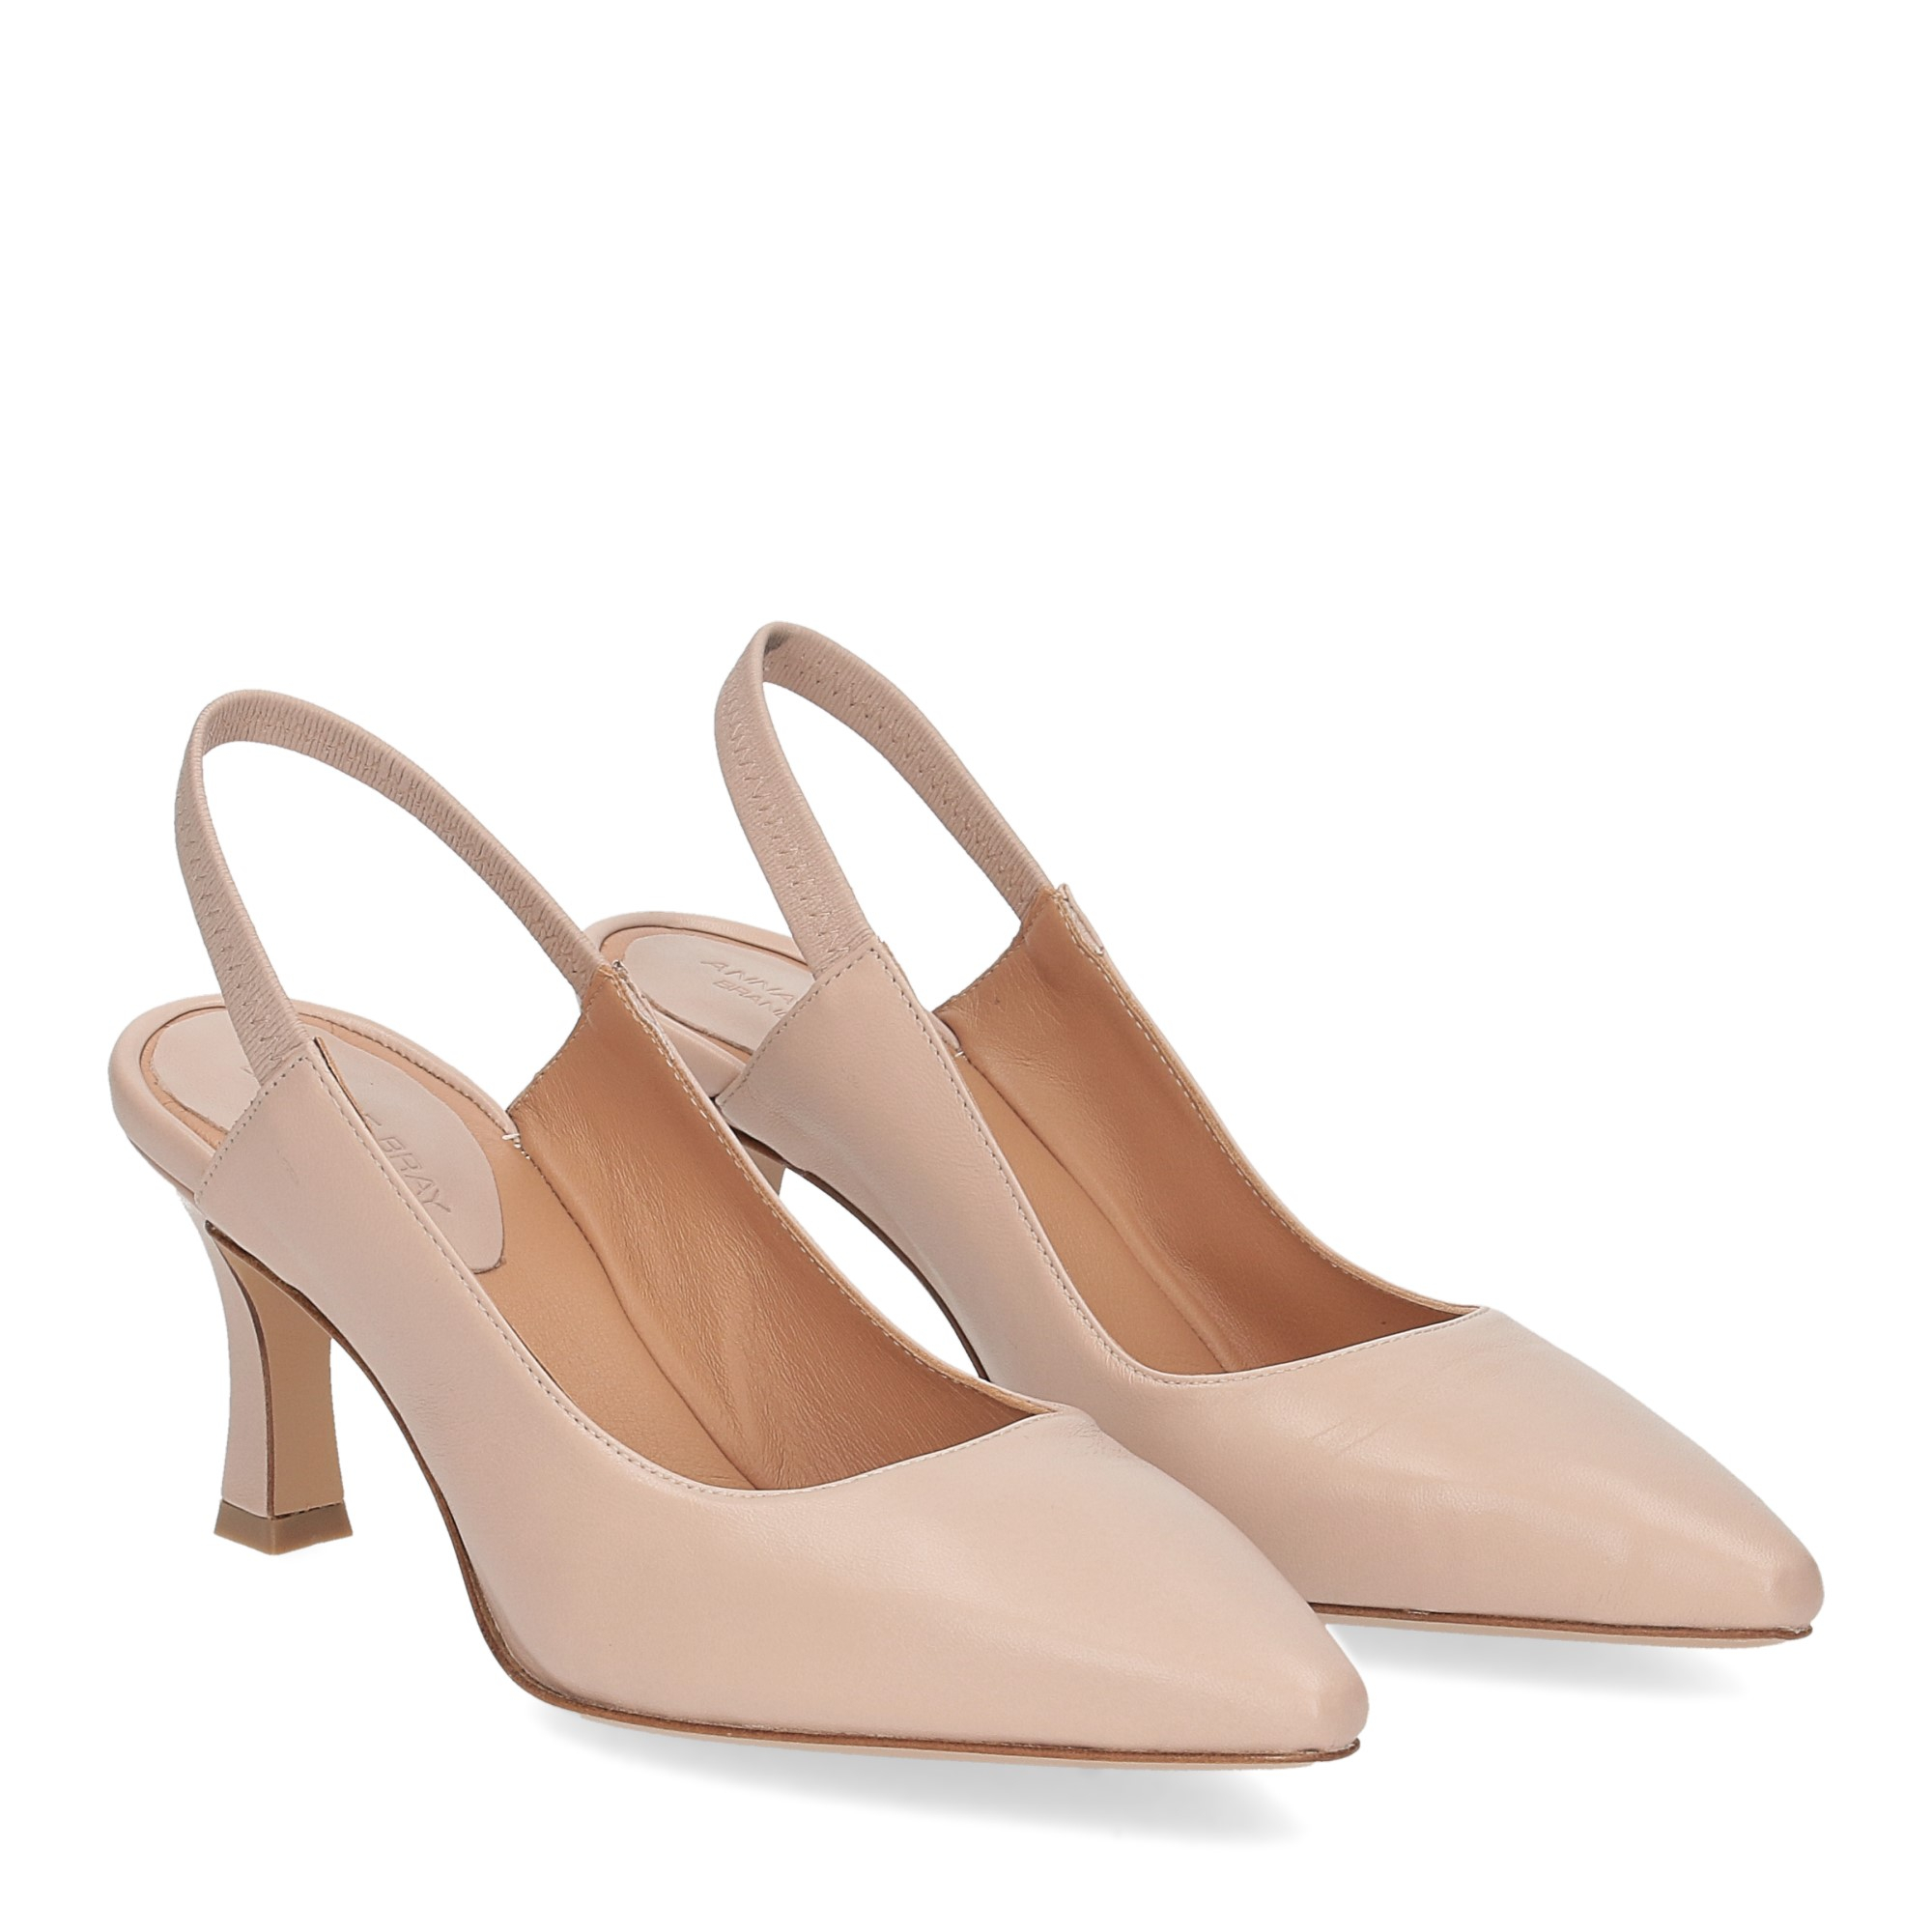 Anna de Bray chanel S7101 pelle rosa